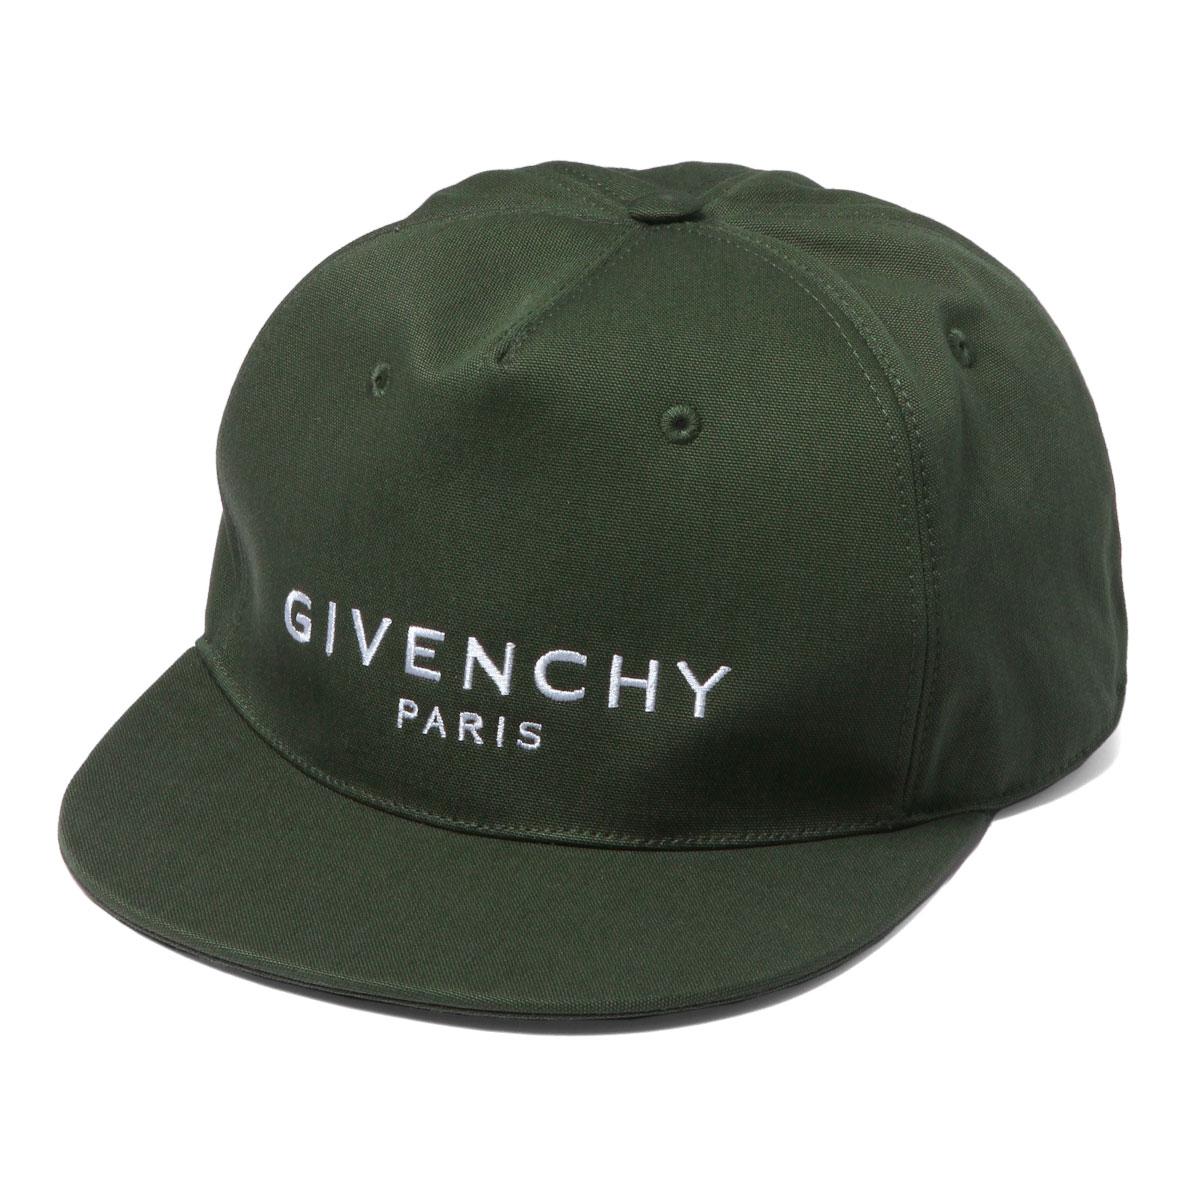 45db402b998 importshopdouble  Givenchy GIVENCHY cap men BPZ001P00T 305 KHAKI ...